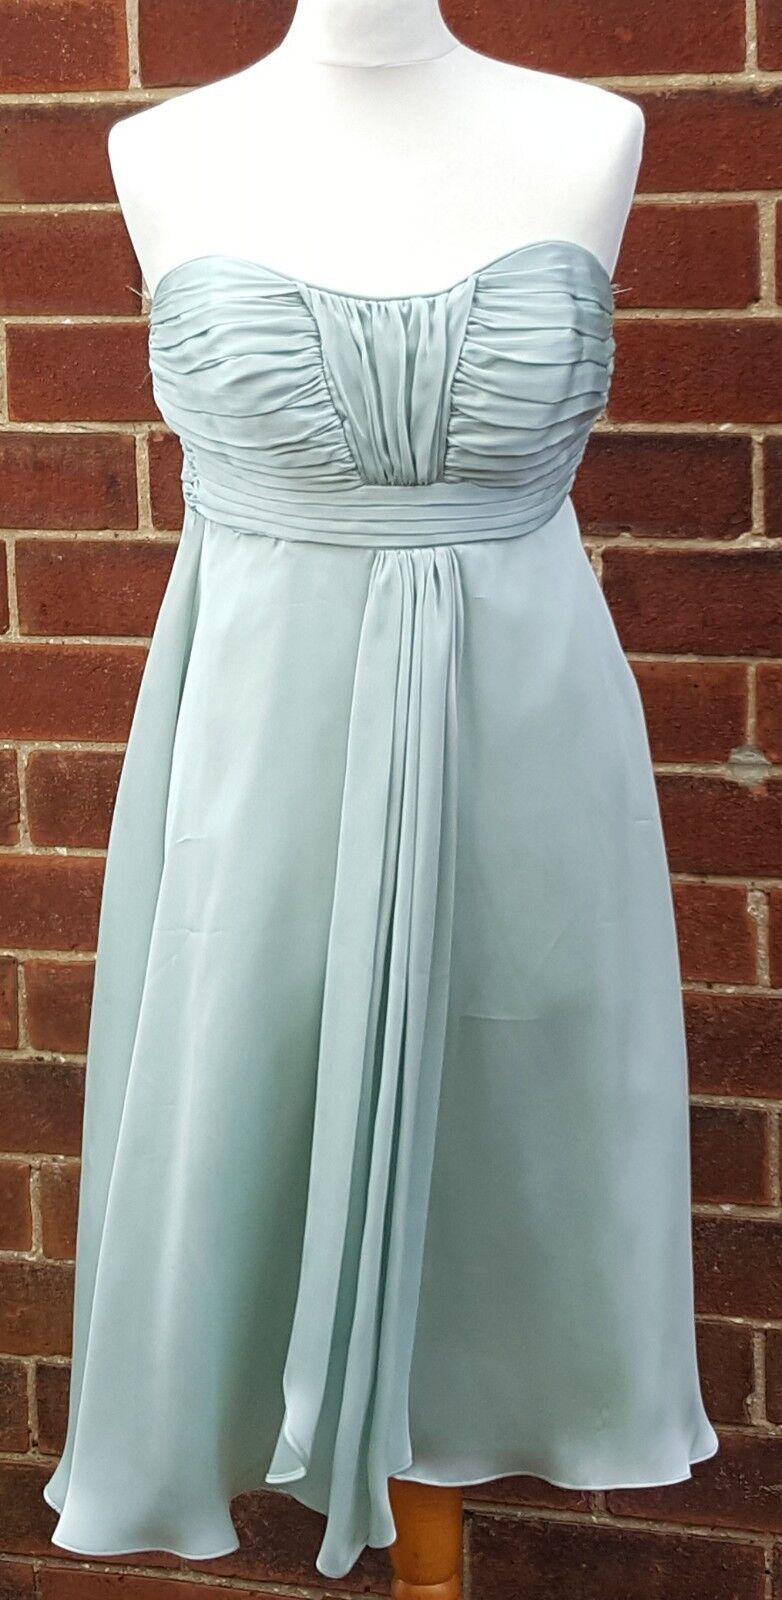 Debenhams Debut Damen Trägerlos Blassgrün Polyester Knielang Kleid UK 10